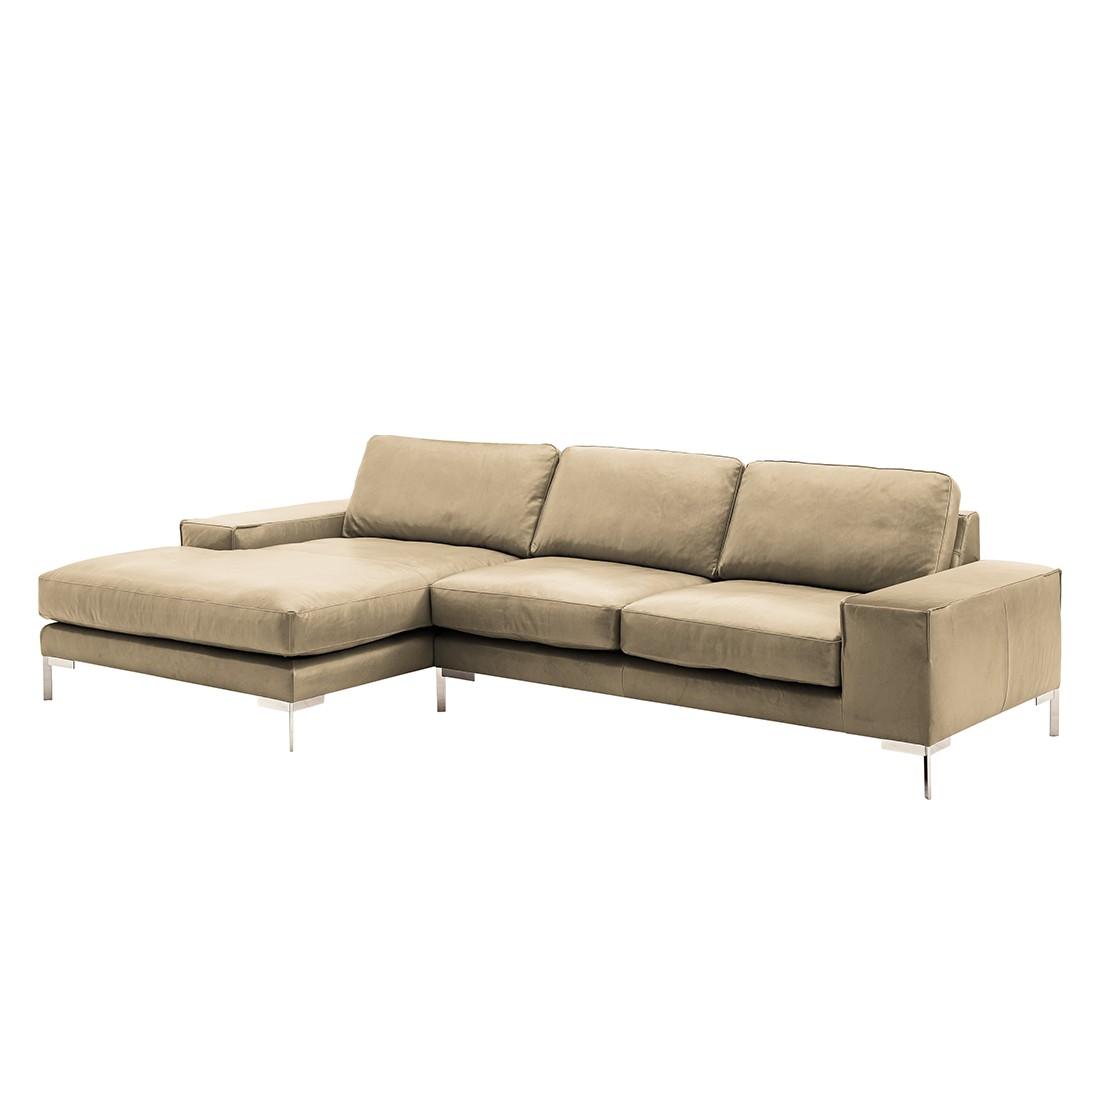 ecksofa lenox i echtleder ohne kopfst tze longchair ottomane davorstehend links taupe. Black Bedroom Furniture Sets. Home Design Ideas